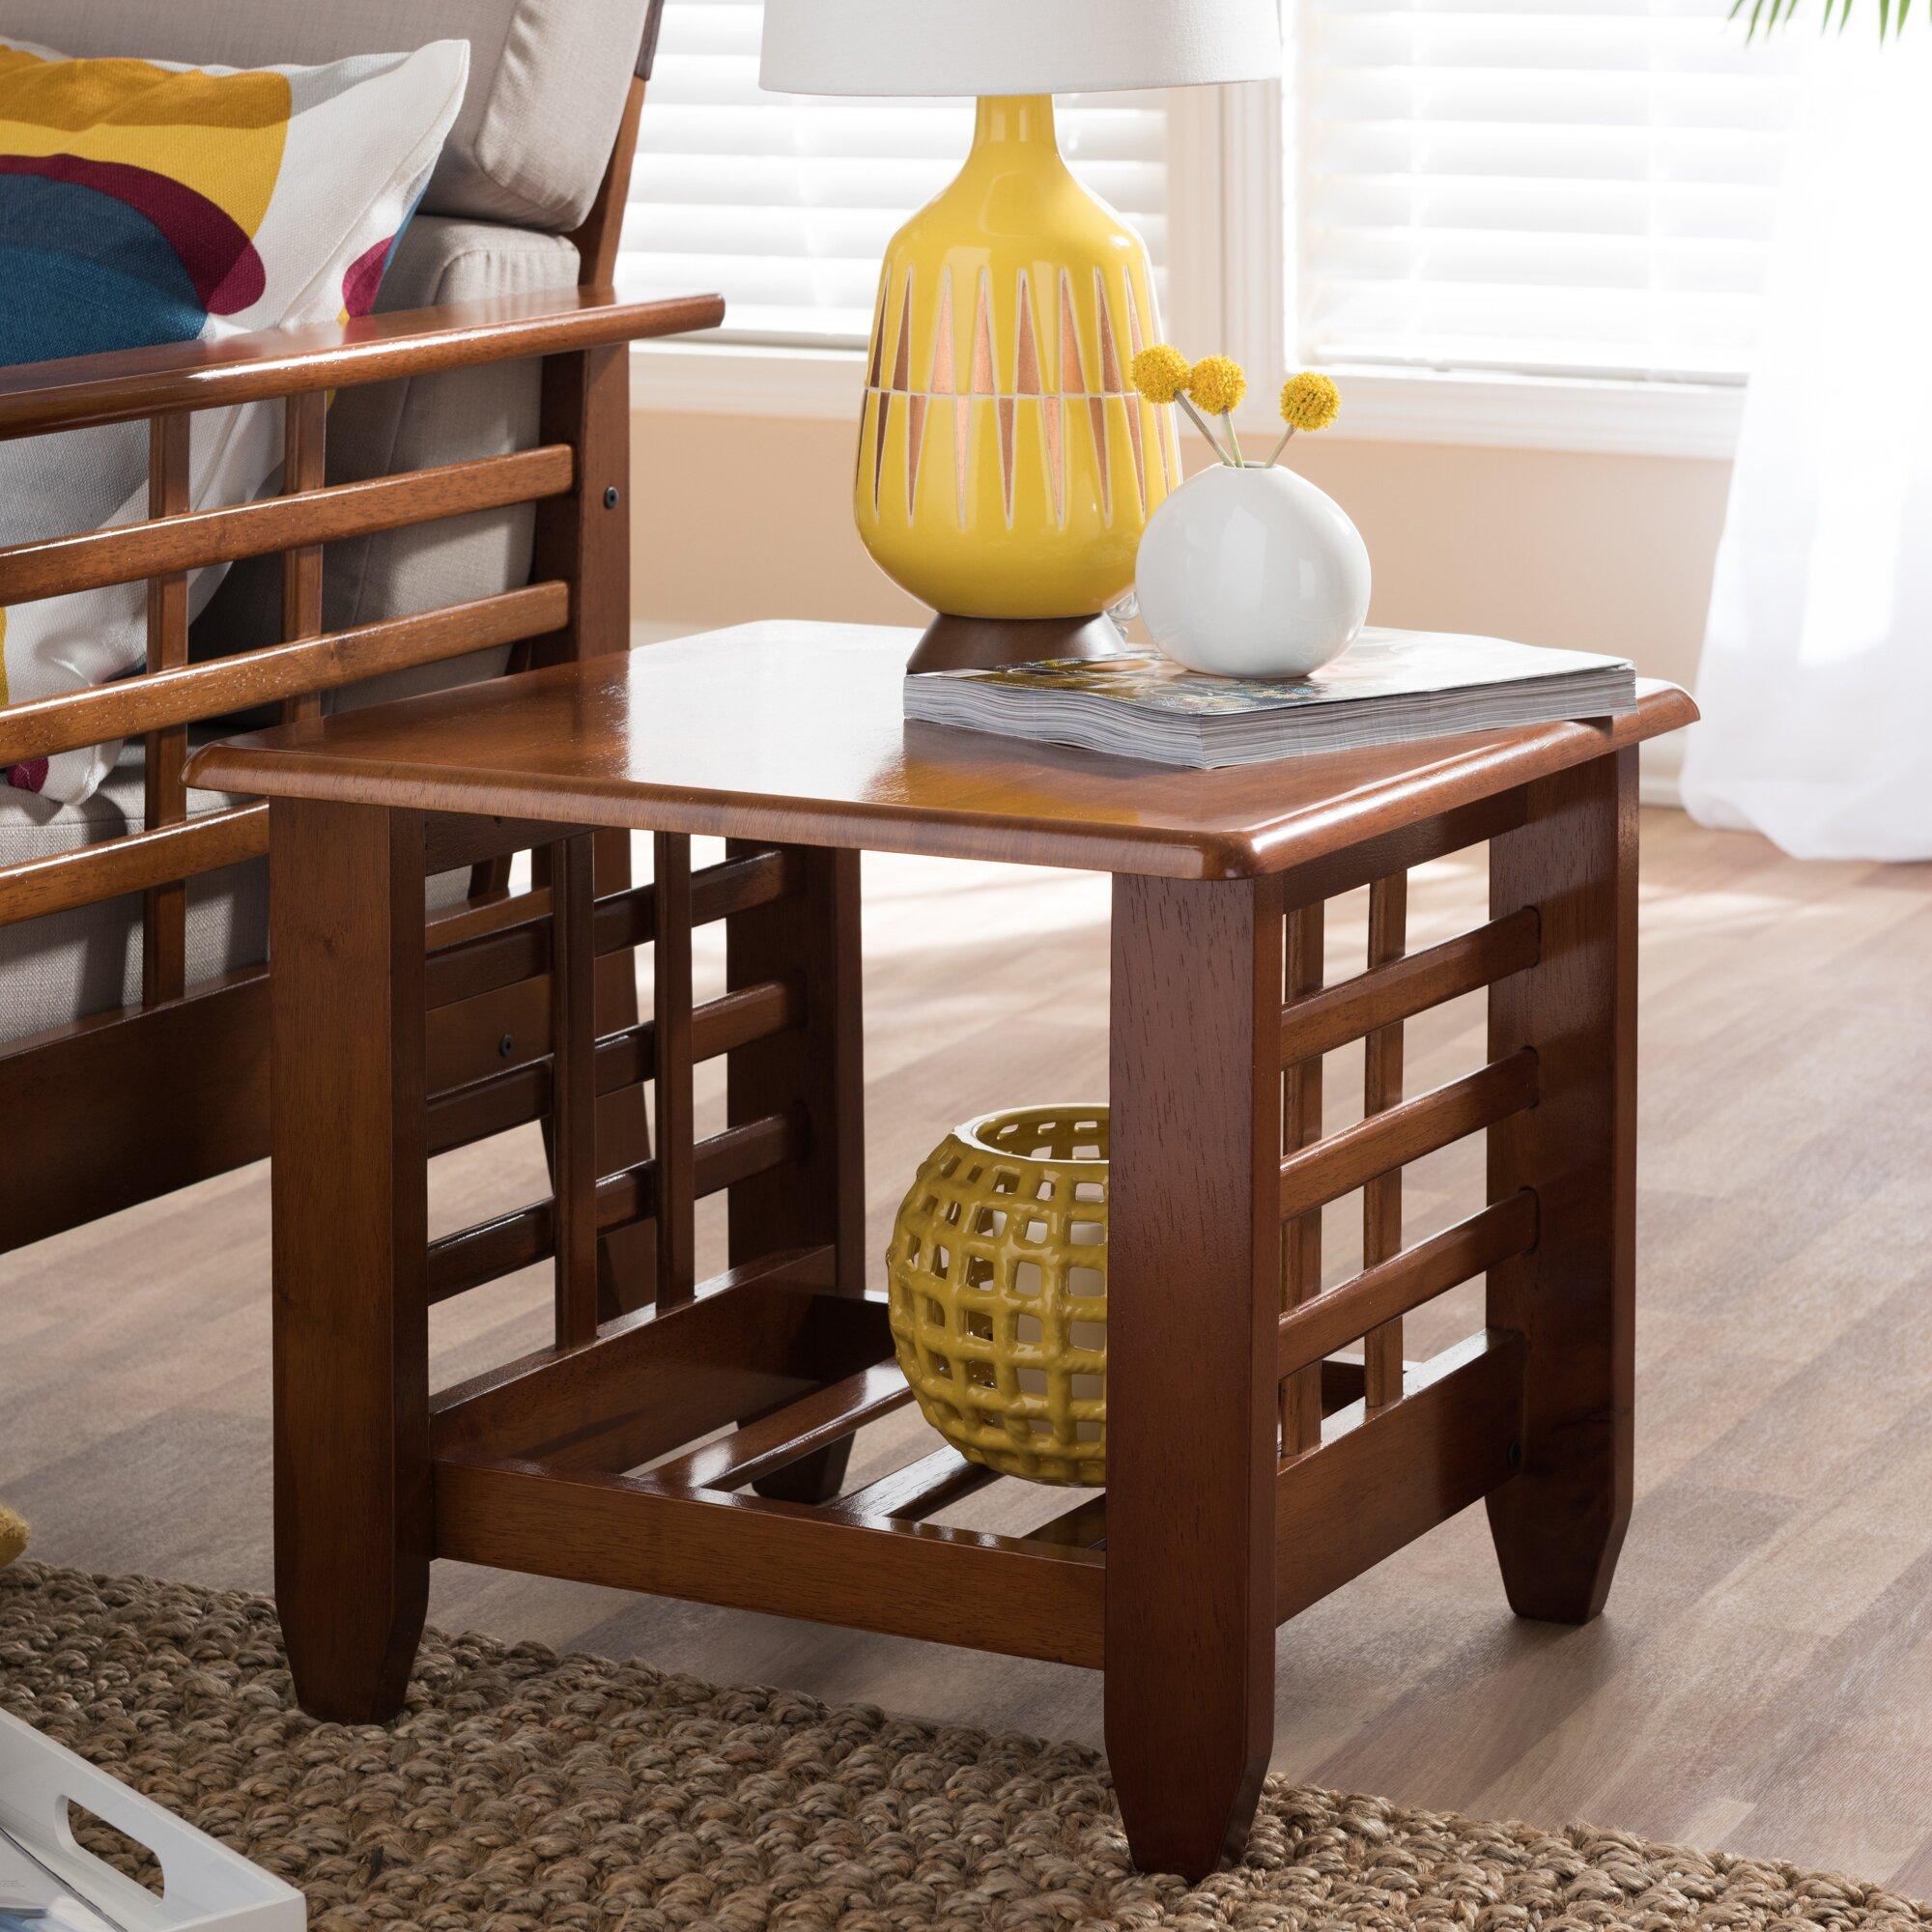 Wholesale Interiors Baxton Studio End Table & Reviews